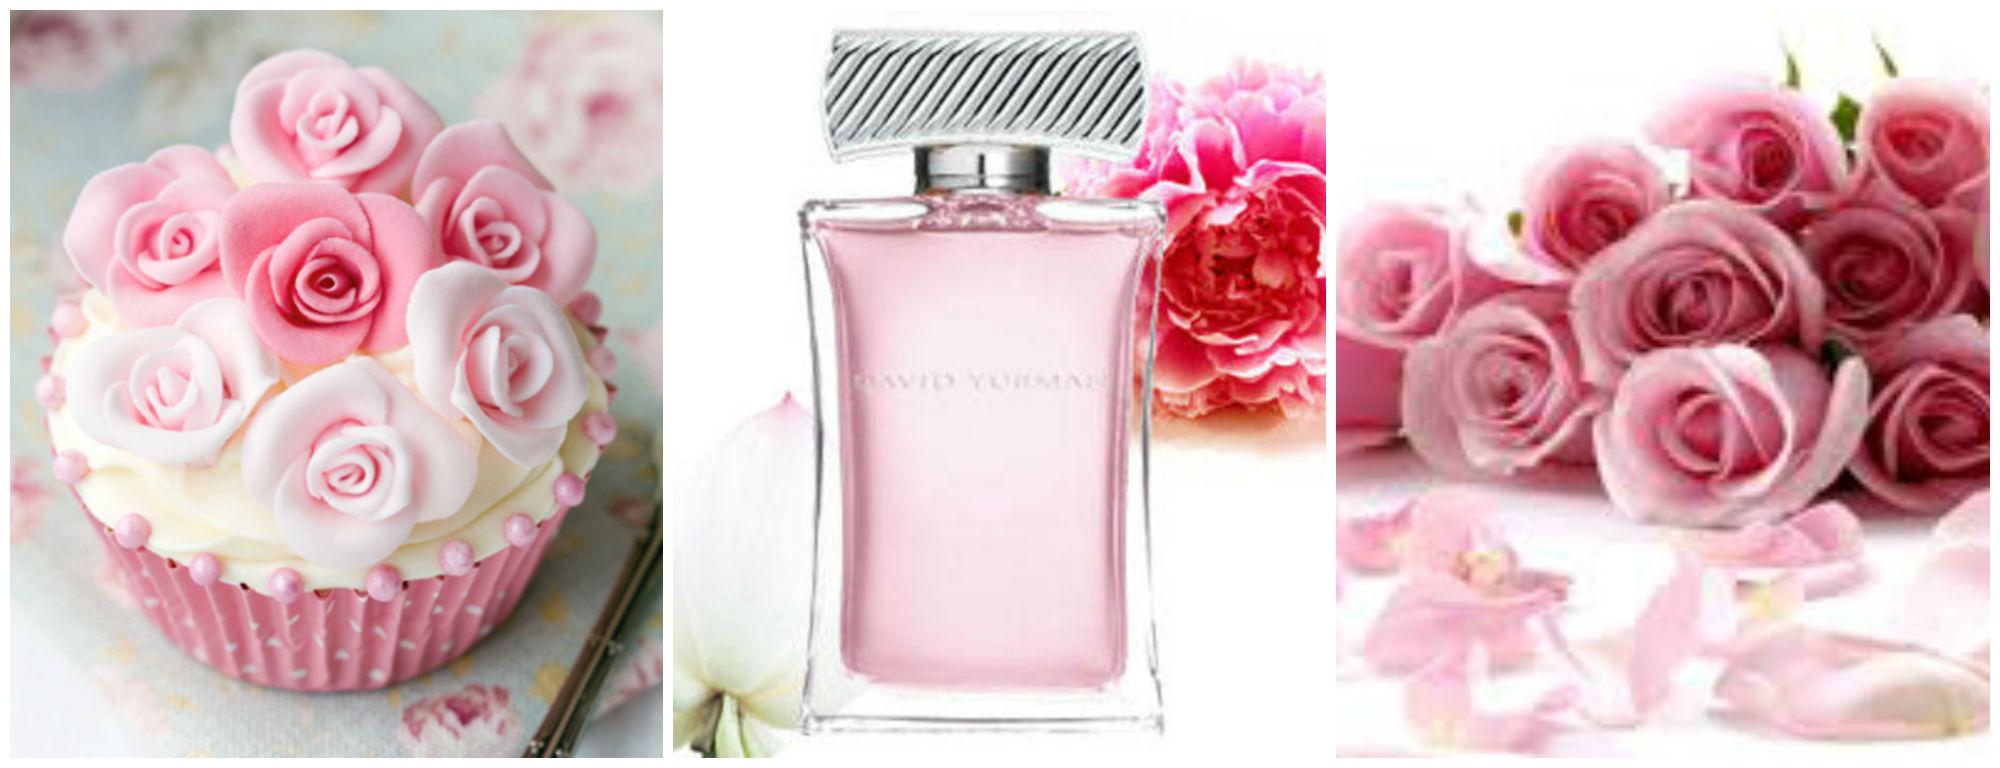 Perfume of the Day: David Yurman Delicate Essence